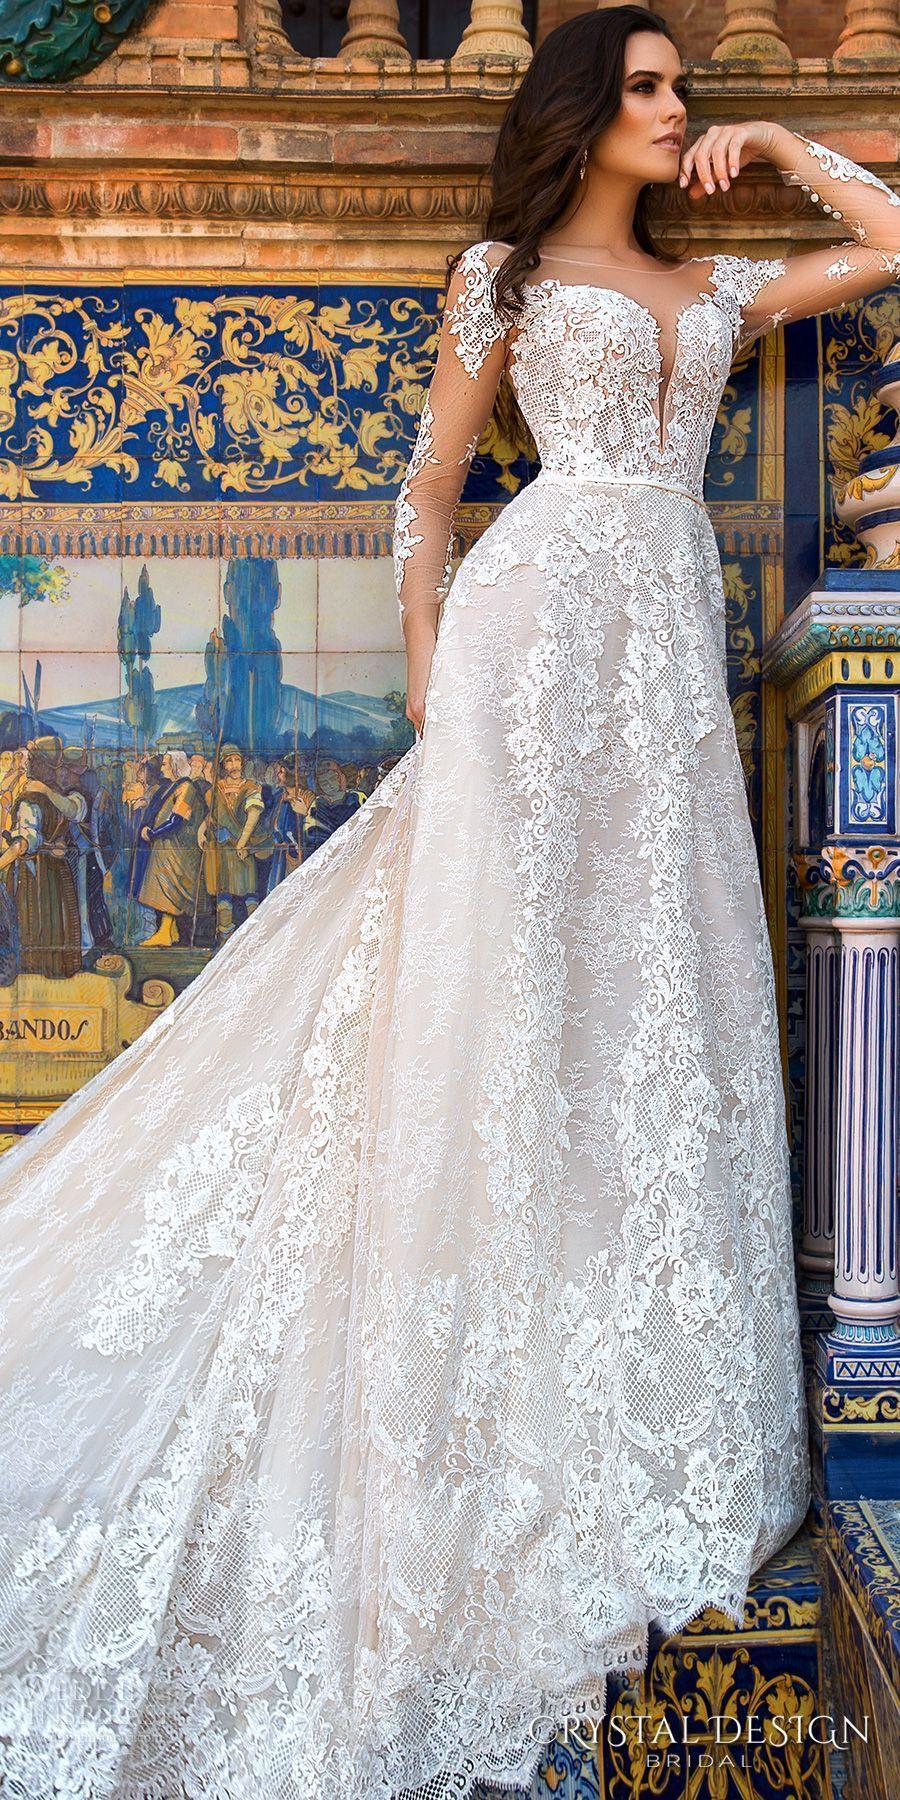 Crystal design bridal long sleeves illusion bateau deep